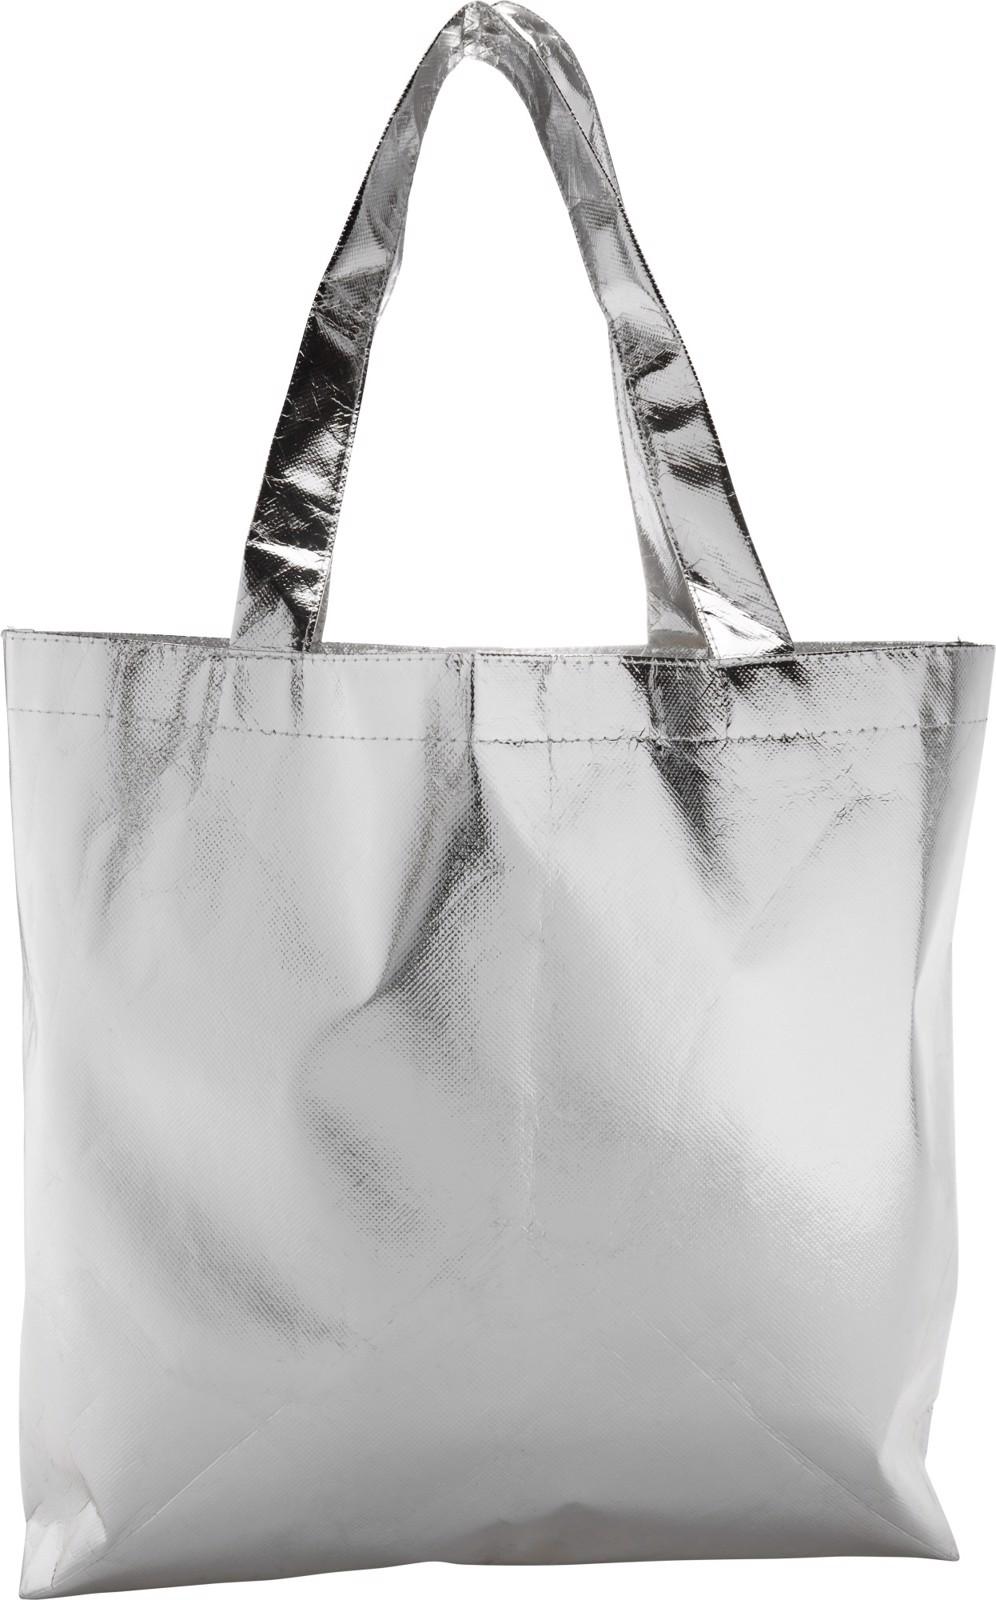 Nonwoven (80 gr/m²) laminated shopping bag - Silver